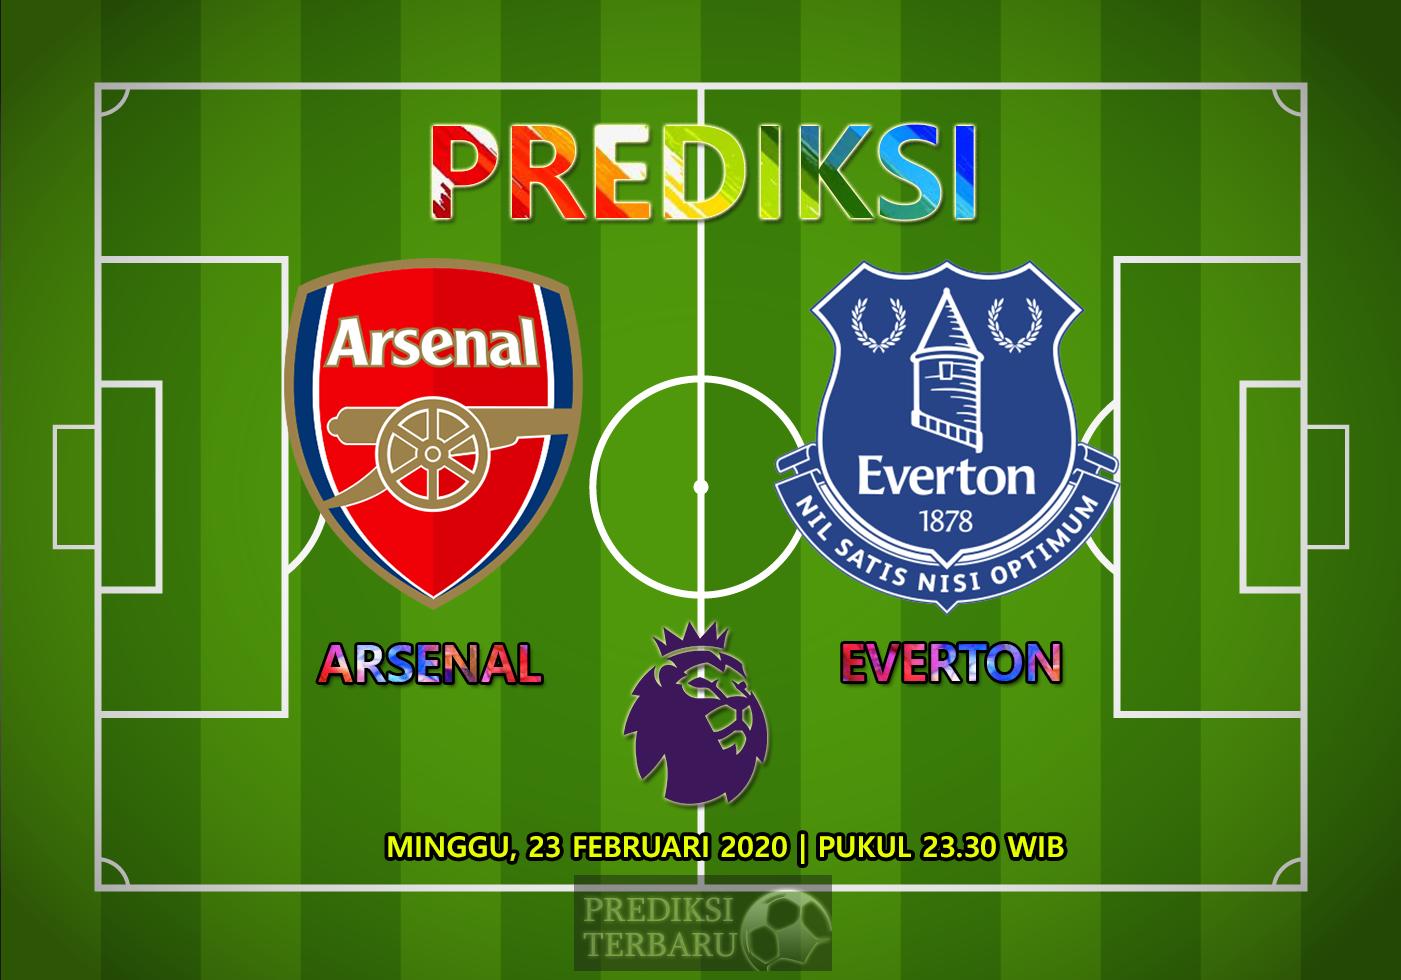 Prediksi Arsenal Vs Everton, Minggu 23 Februari